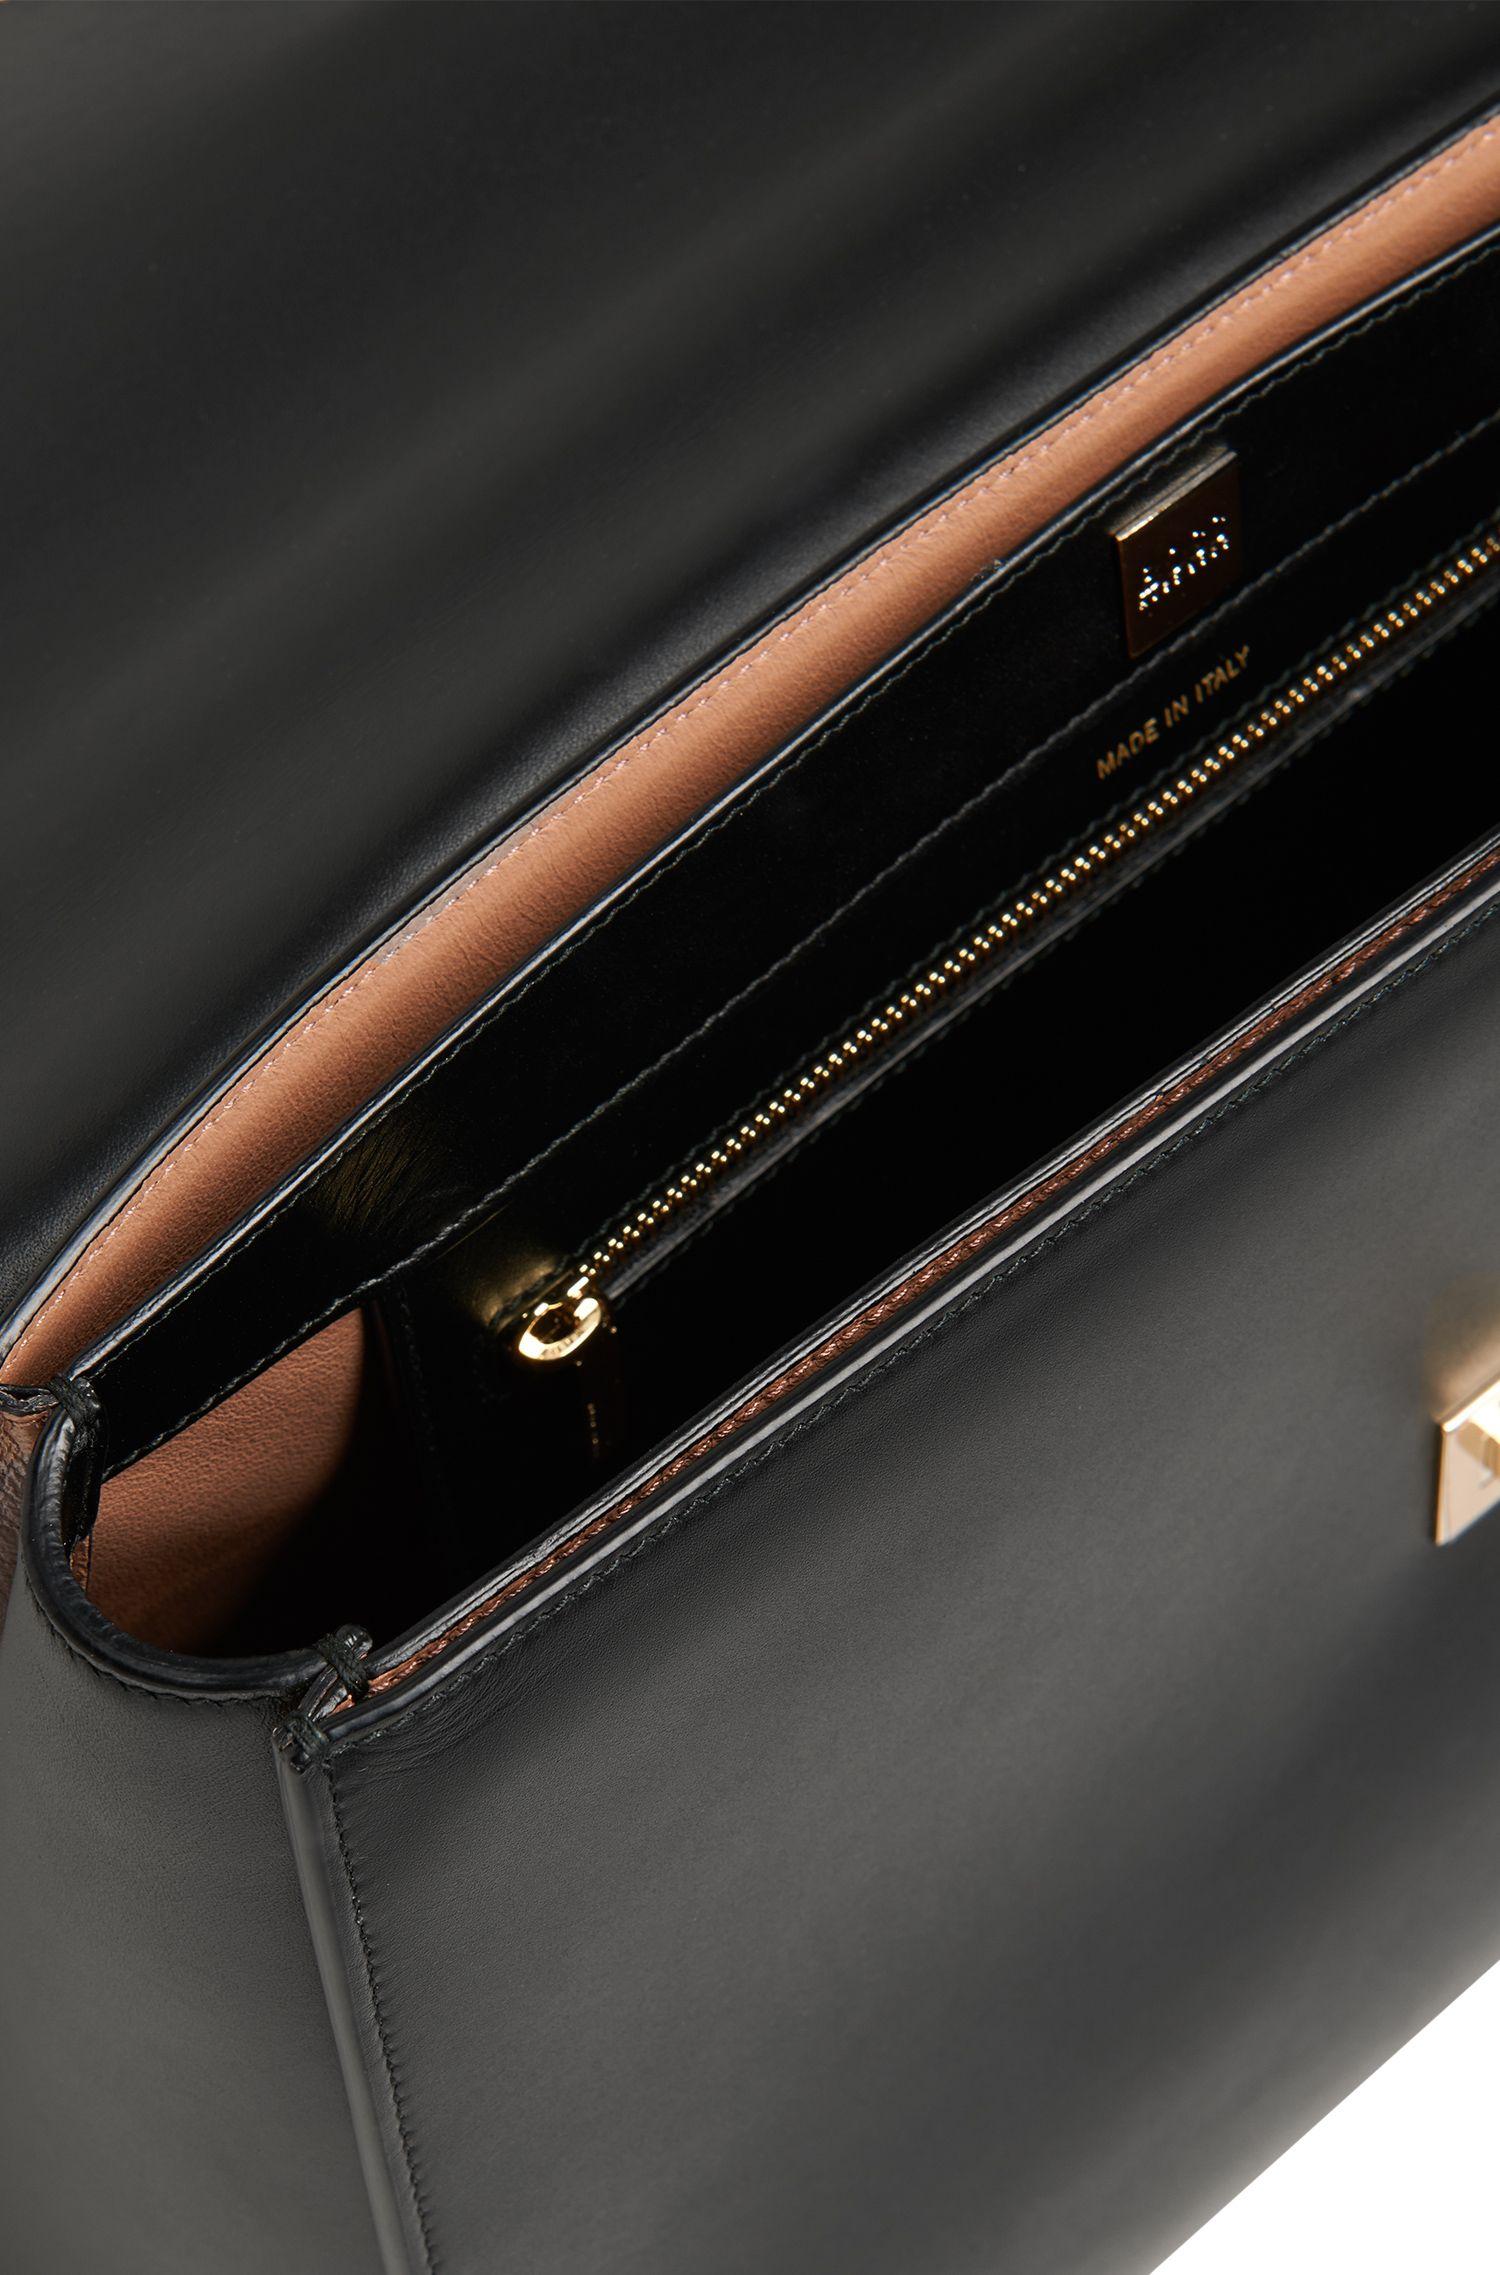 BOSS Bespoke Handtasche aus glattem Leder